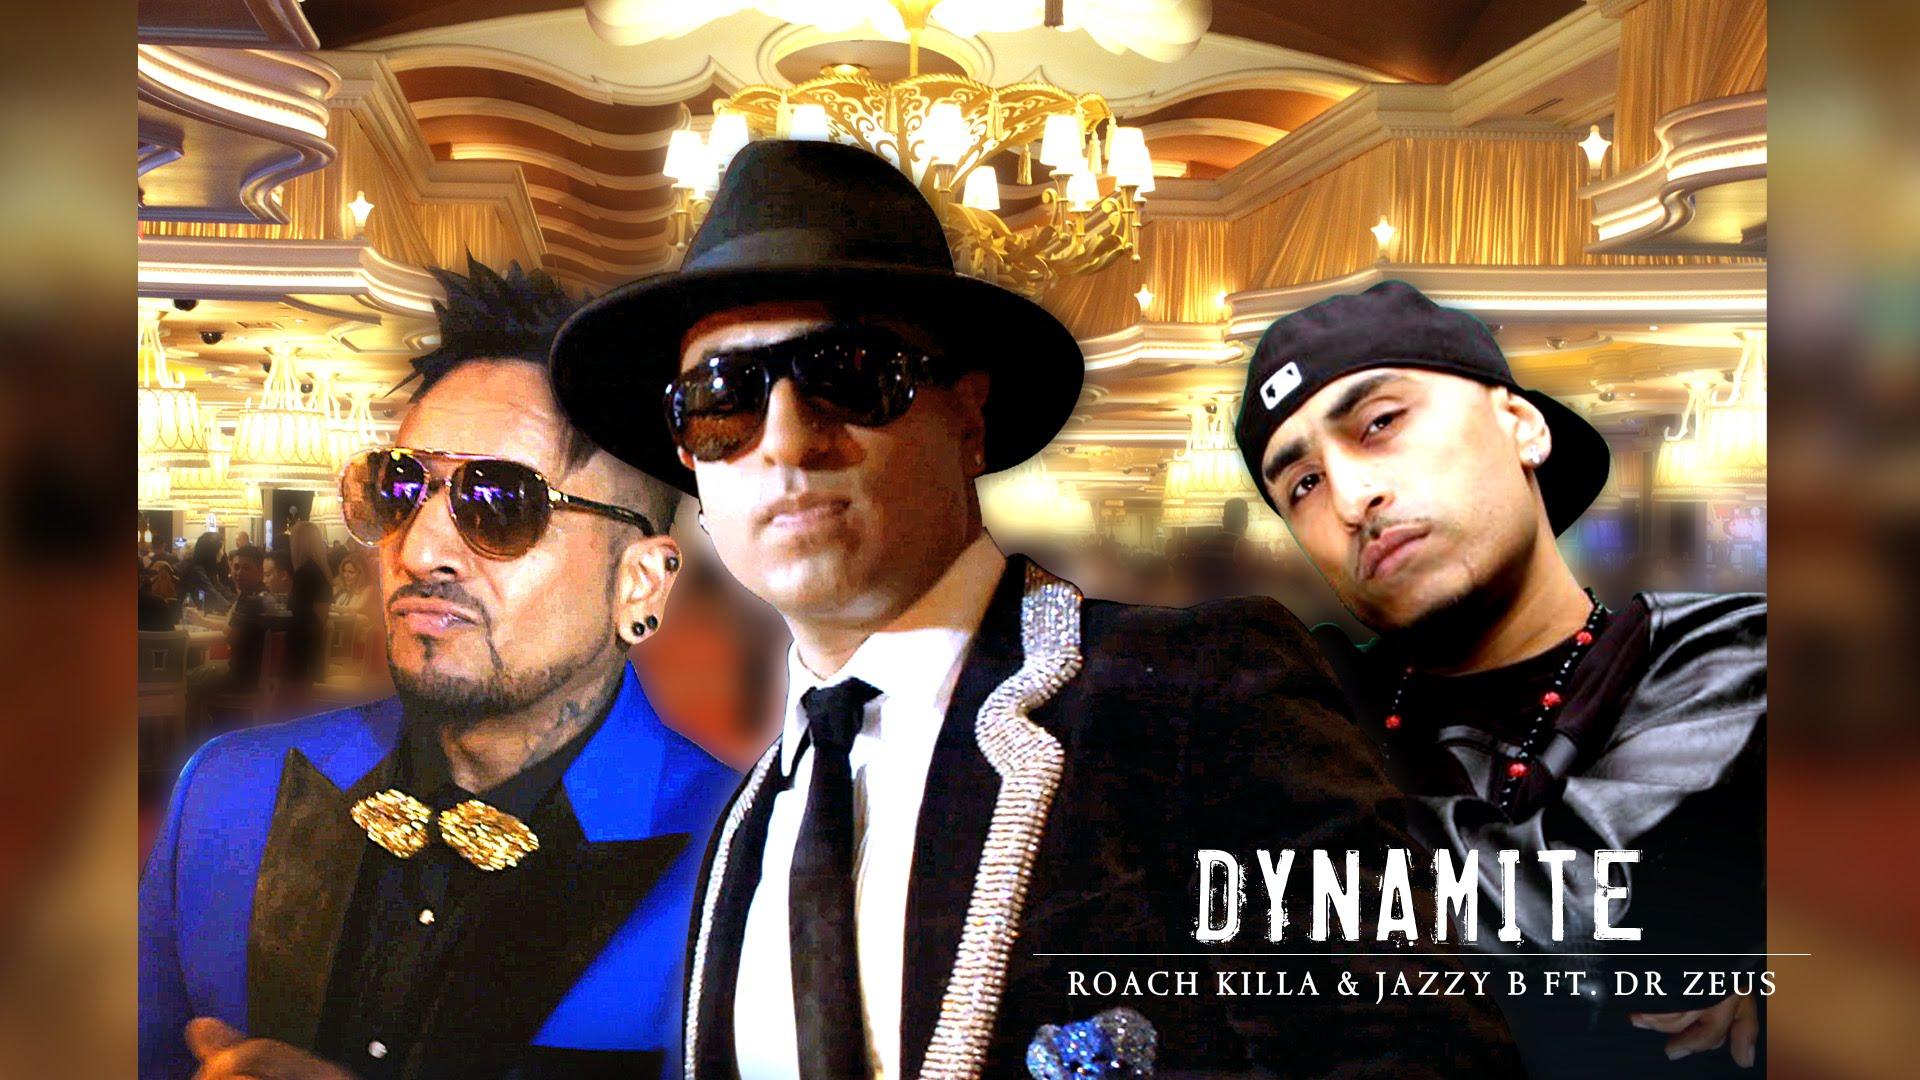 Roach Killa & Jazzy b ft Dr Zeus - Dynamite (Out Now)